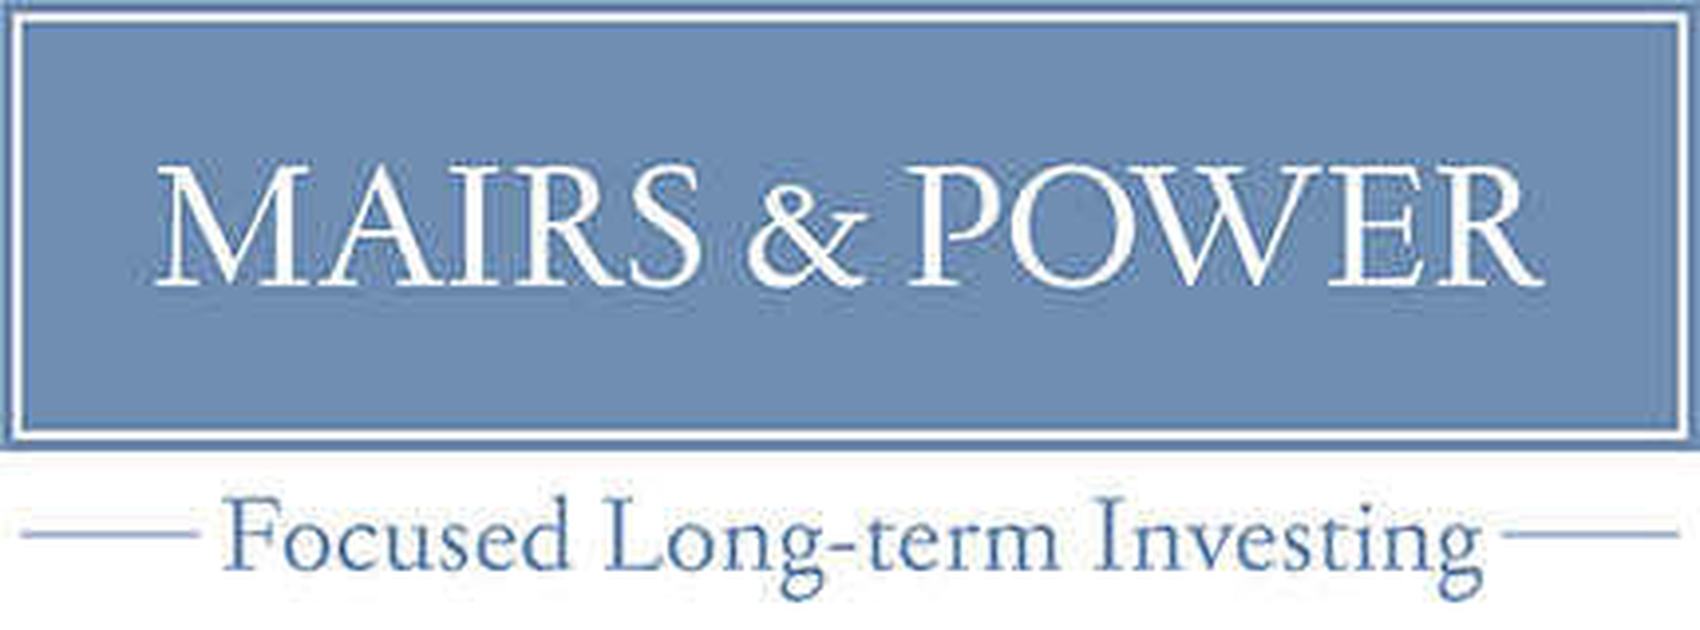 Mairs and Power logo